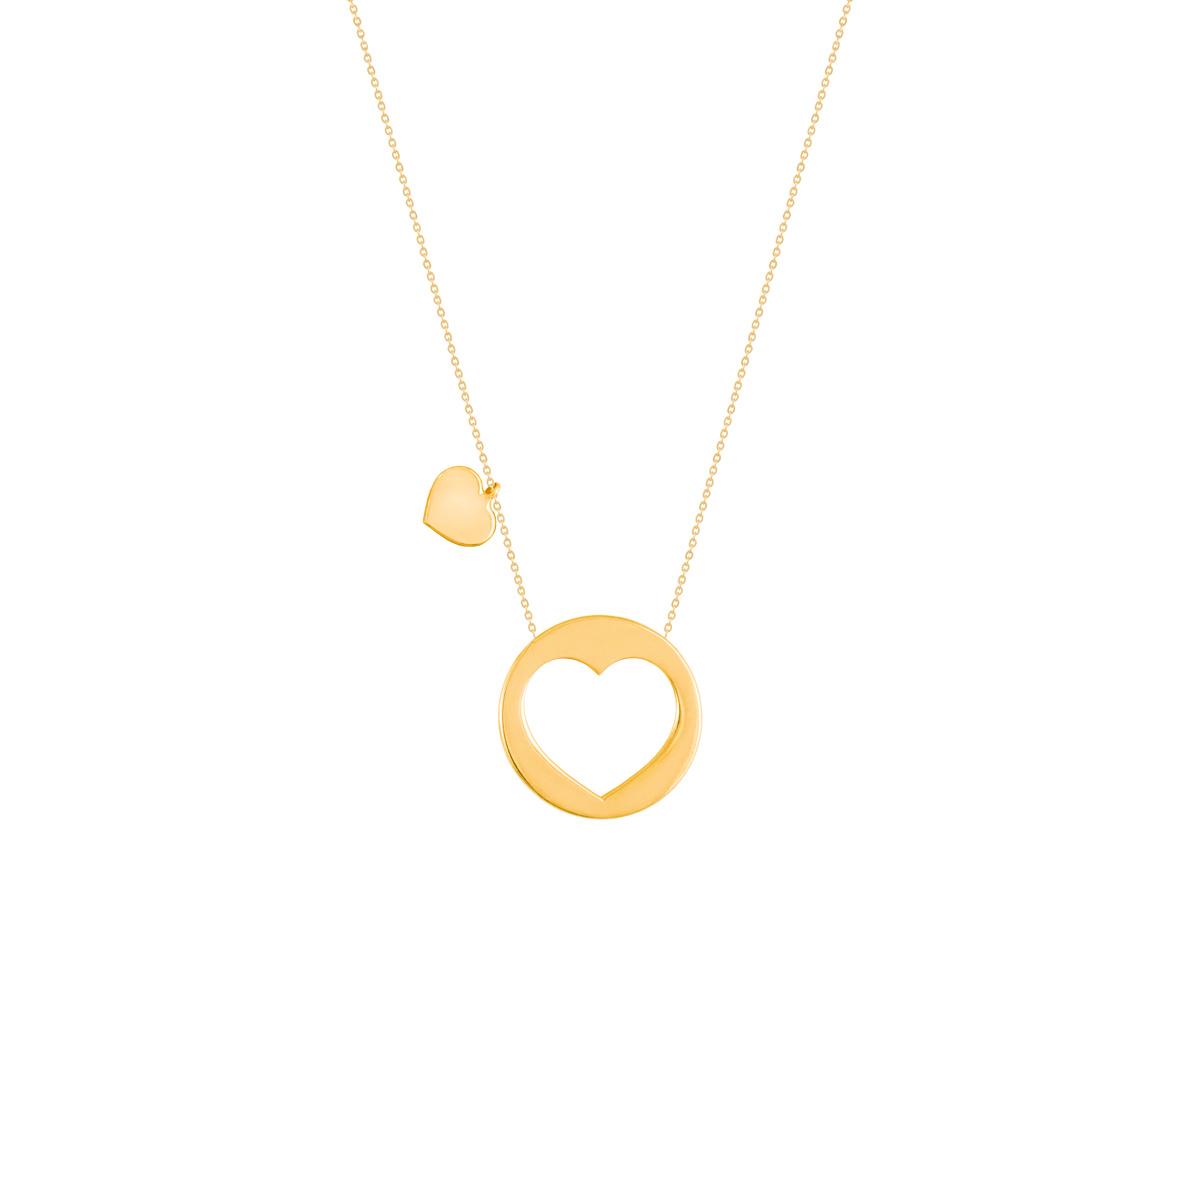 گردنبند طلا پلاک قلب بزرگ |parasteh